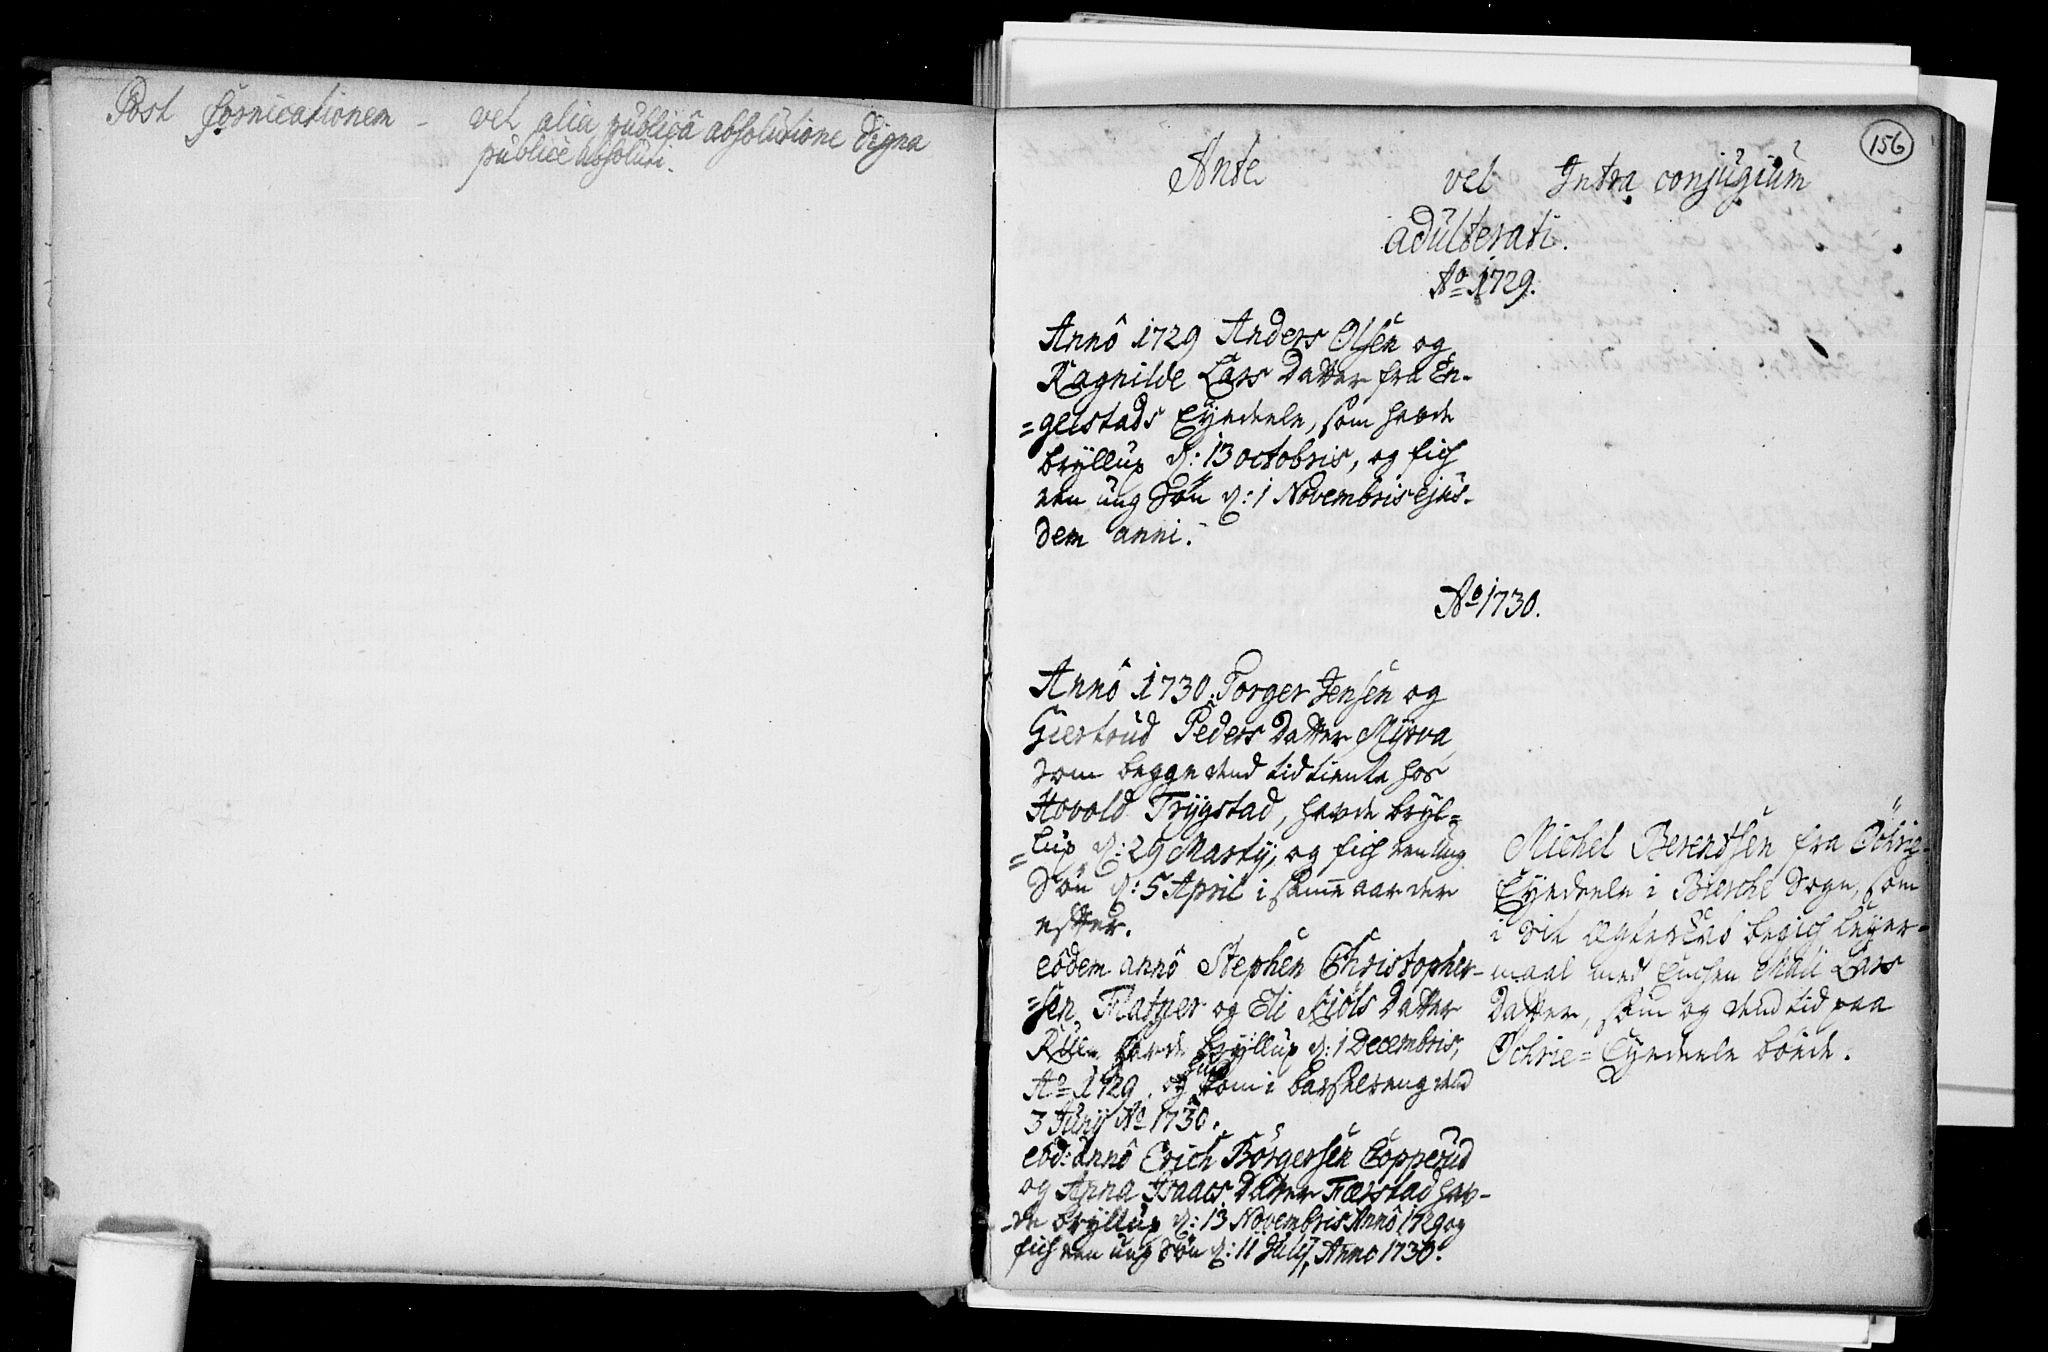 SAO, Nannestad prestekontor Kirkebøker, F/Fa/L0005: Ministerialbok nr. I 5, 1729-1738, s. 156